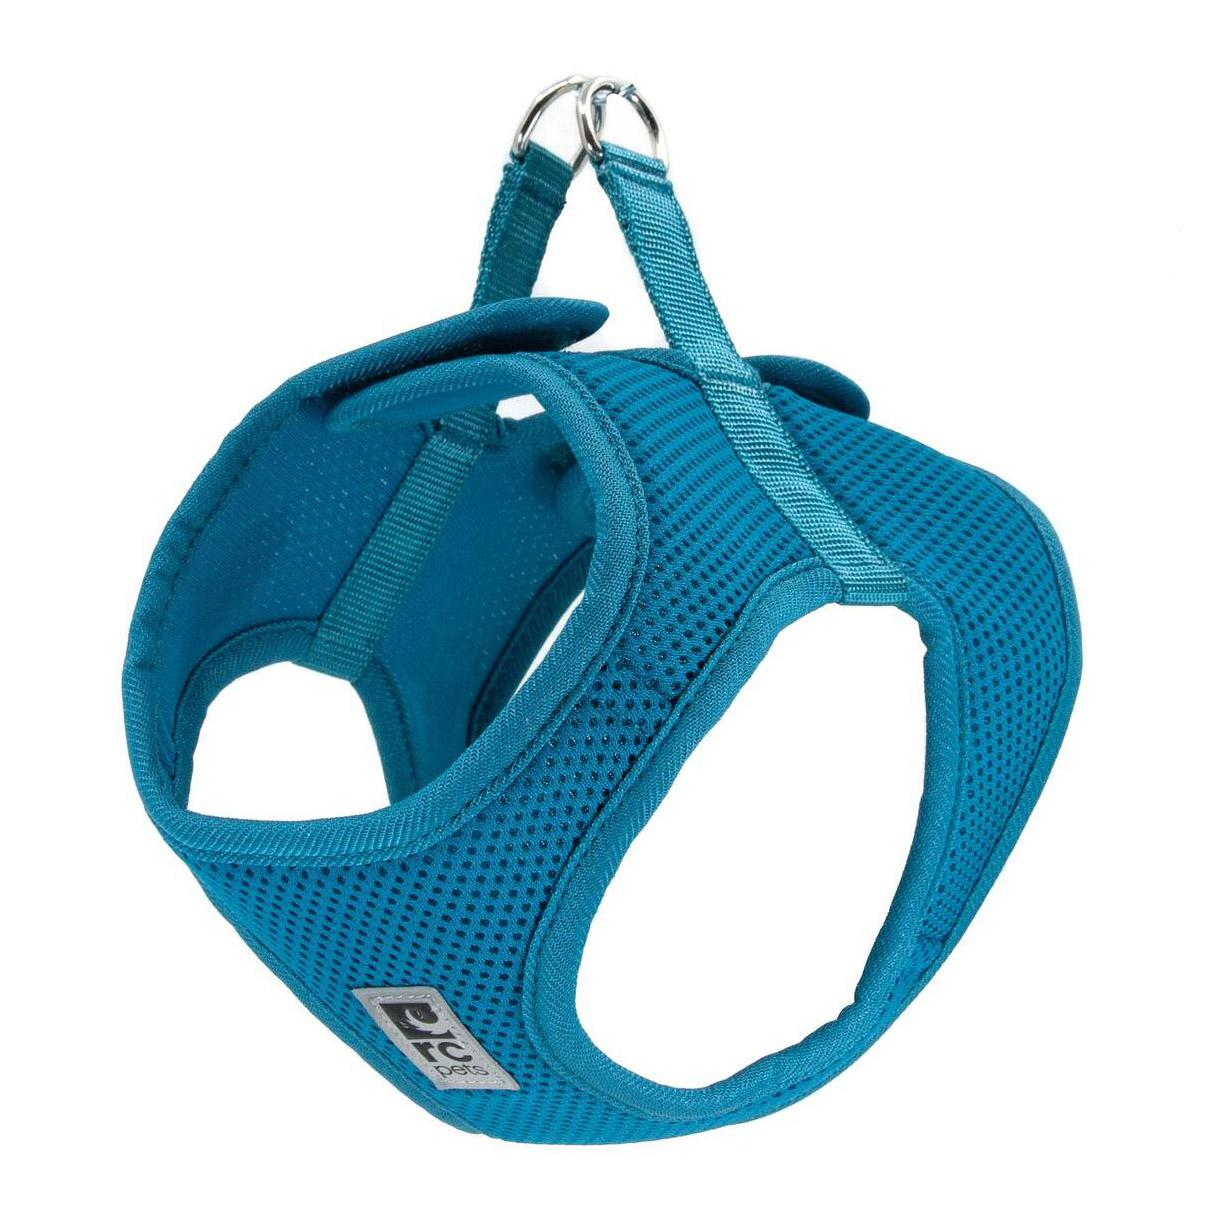 Step-in Cirque Dog Harness - Dark Teal